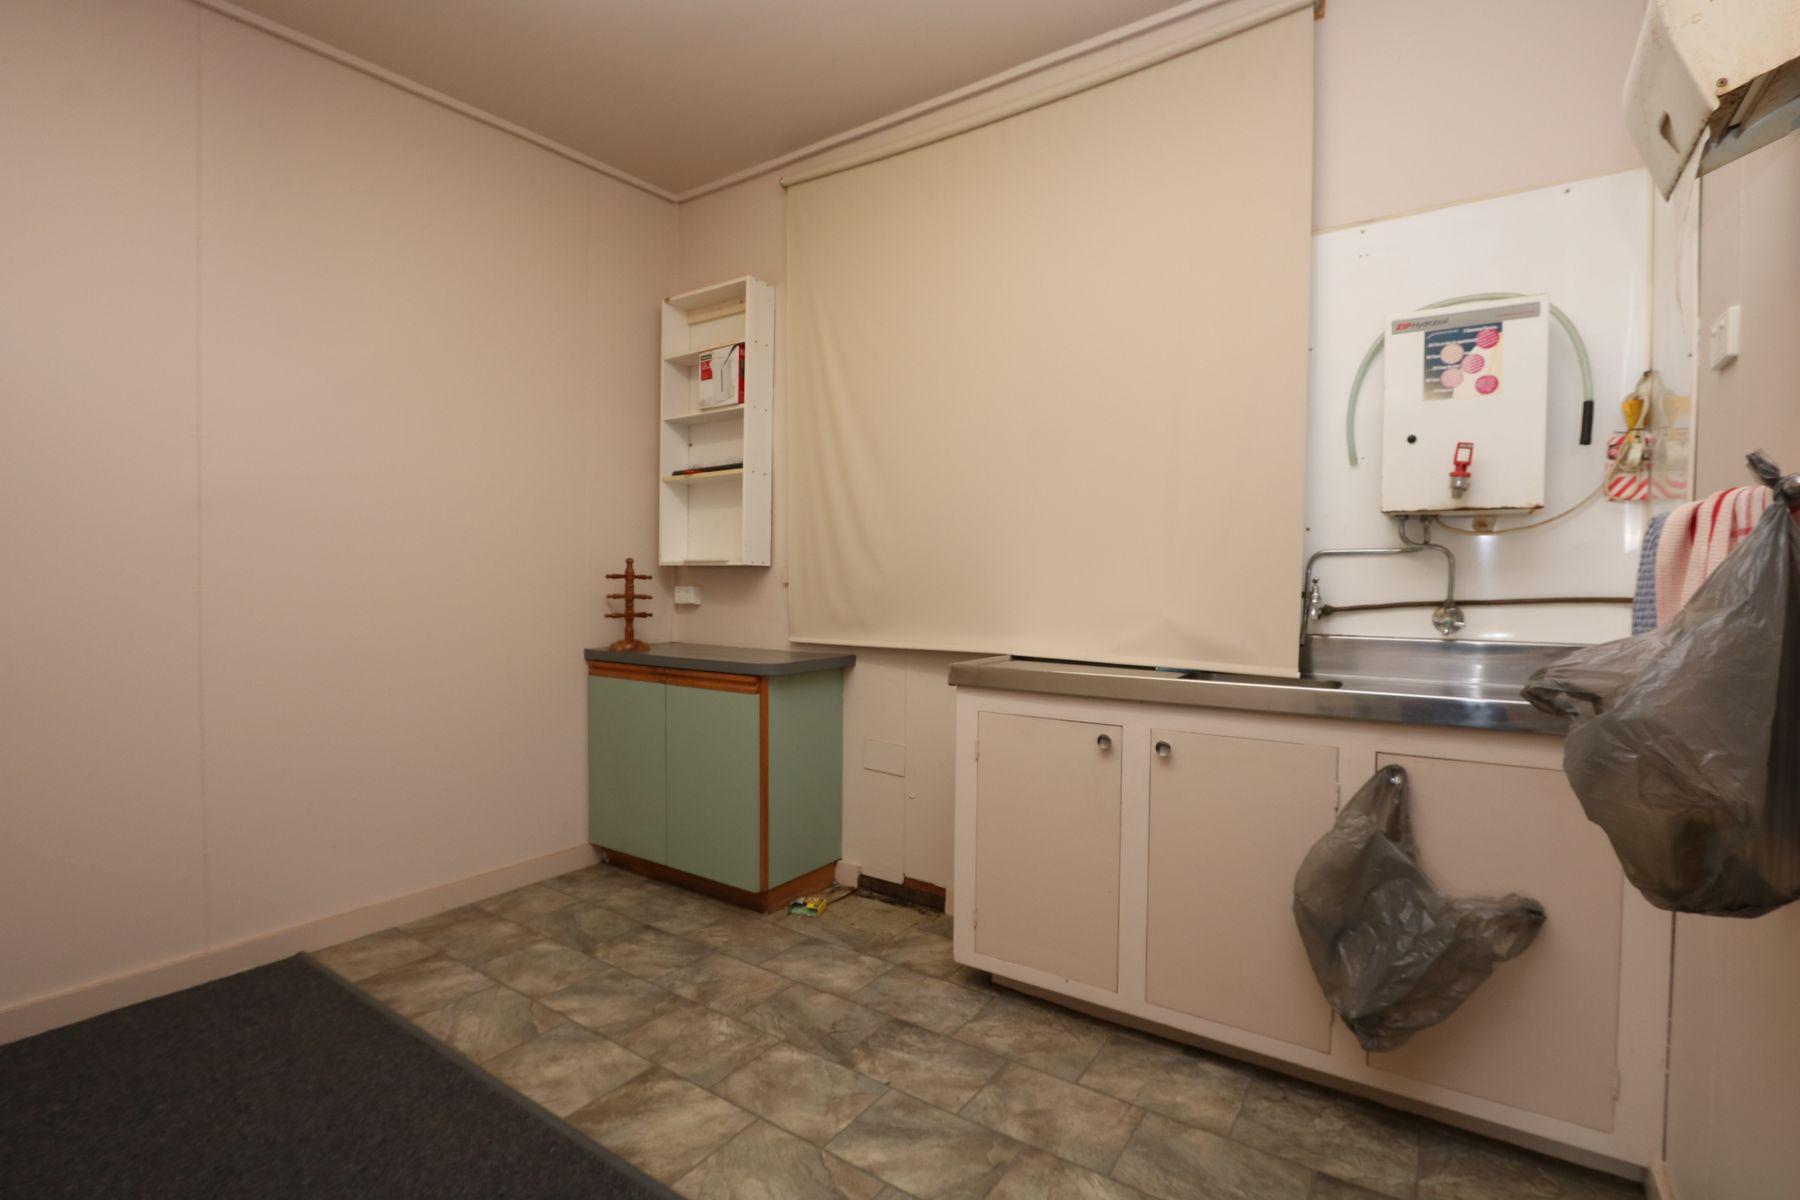 2. Bassett Street, Maryborough, VIC 3465